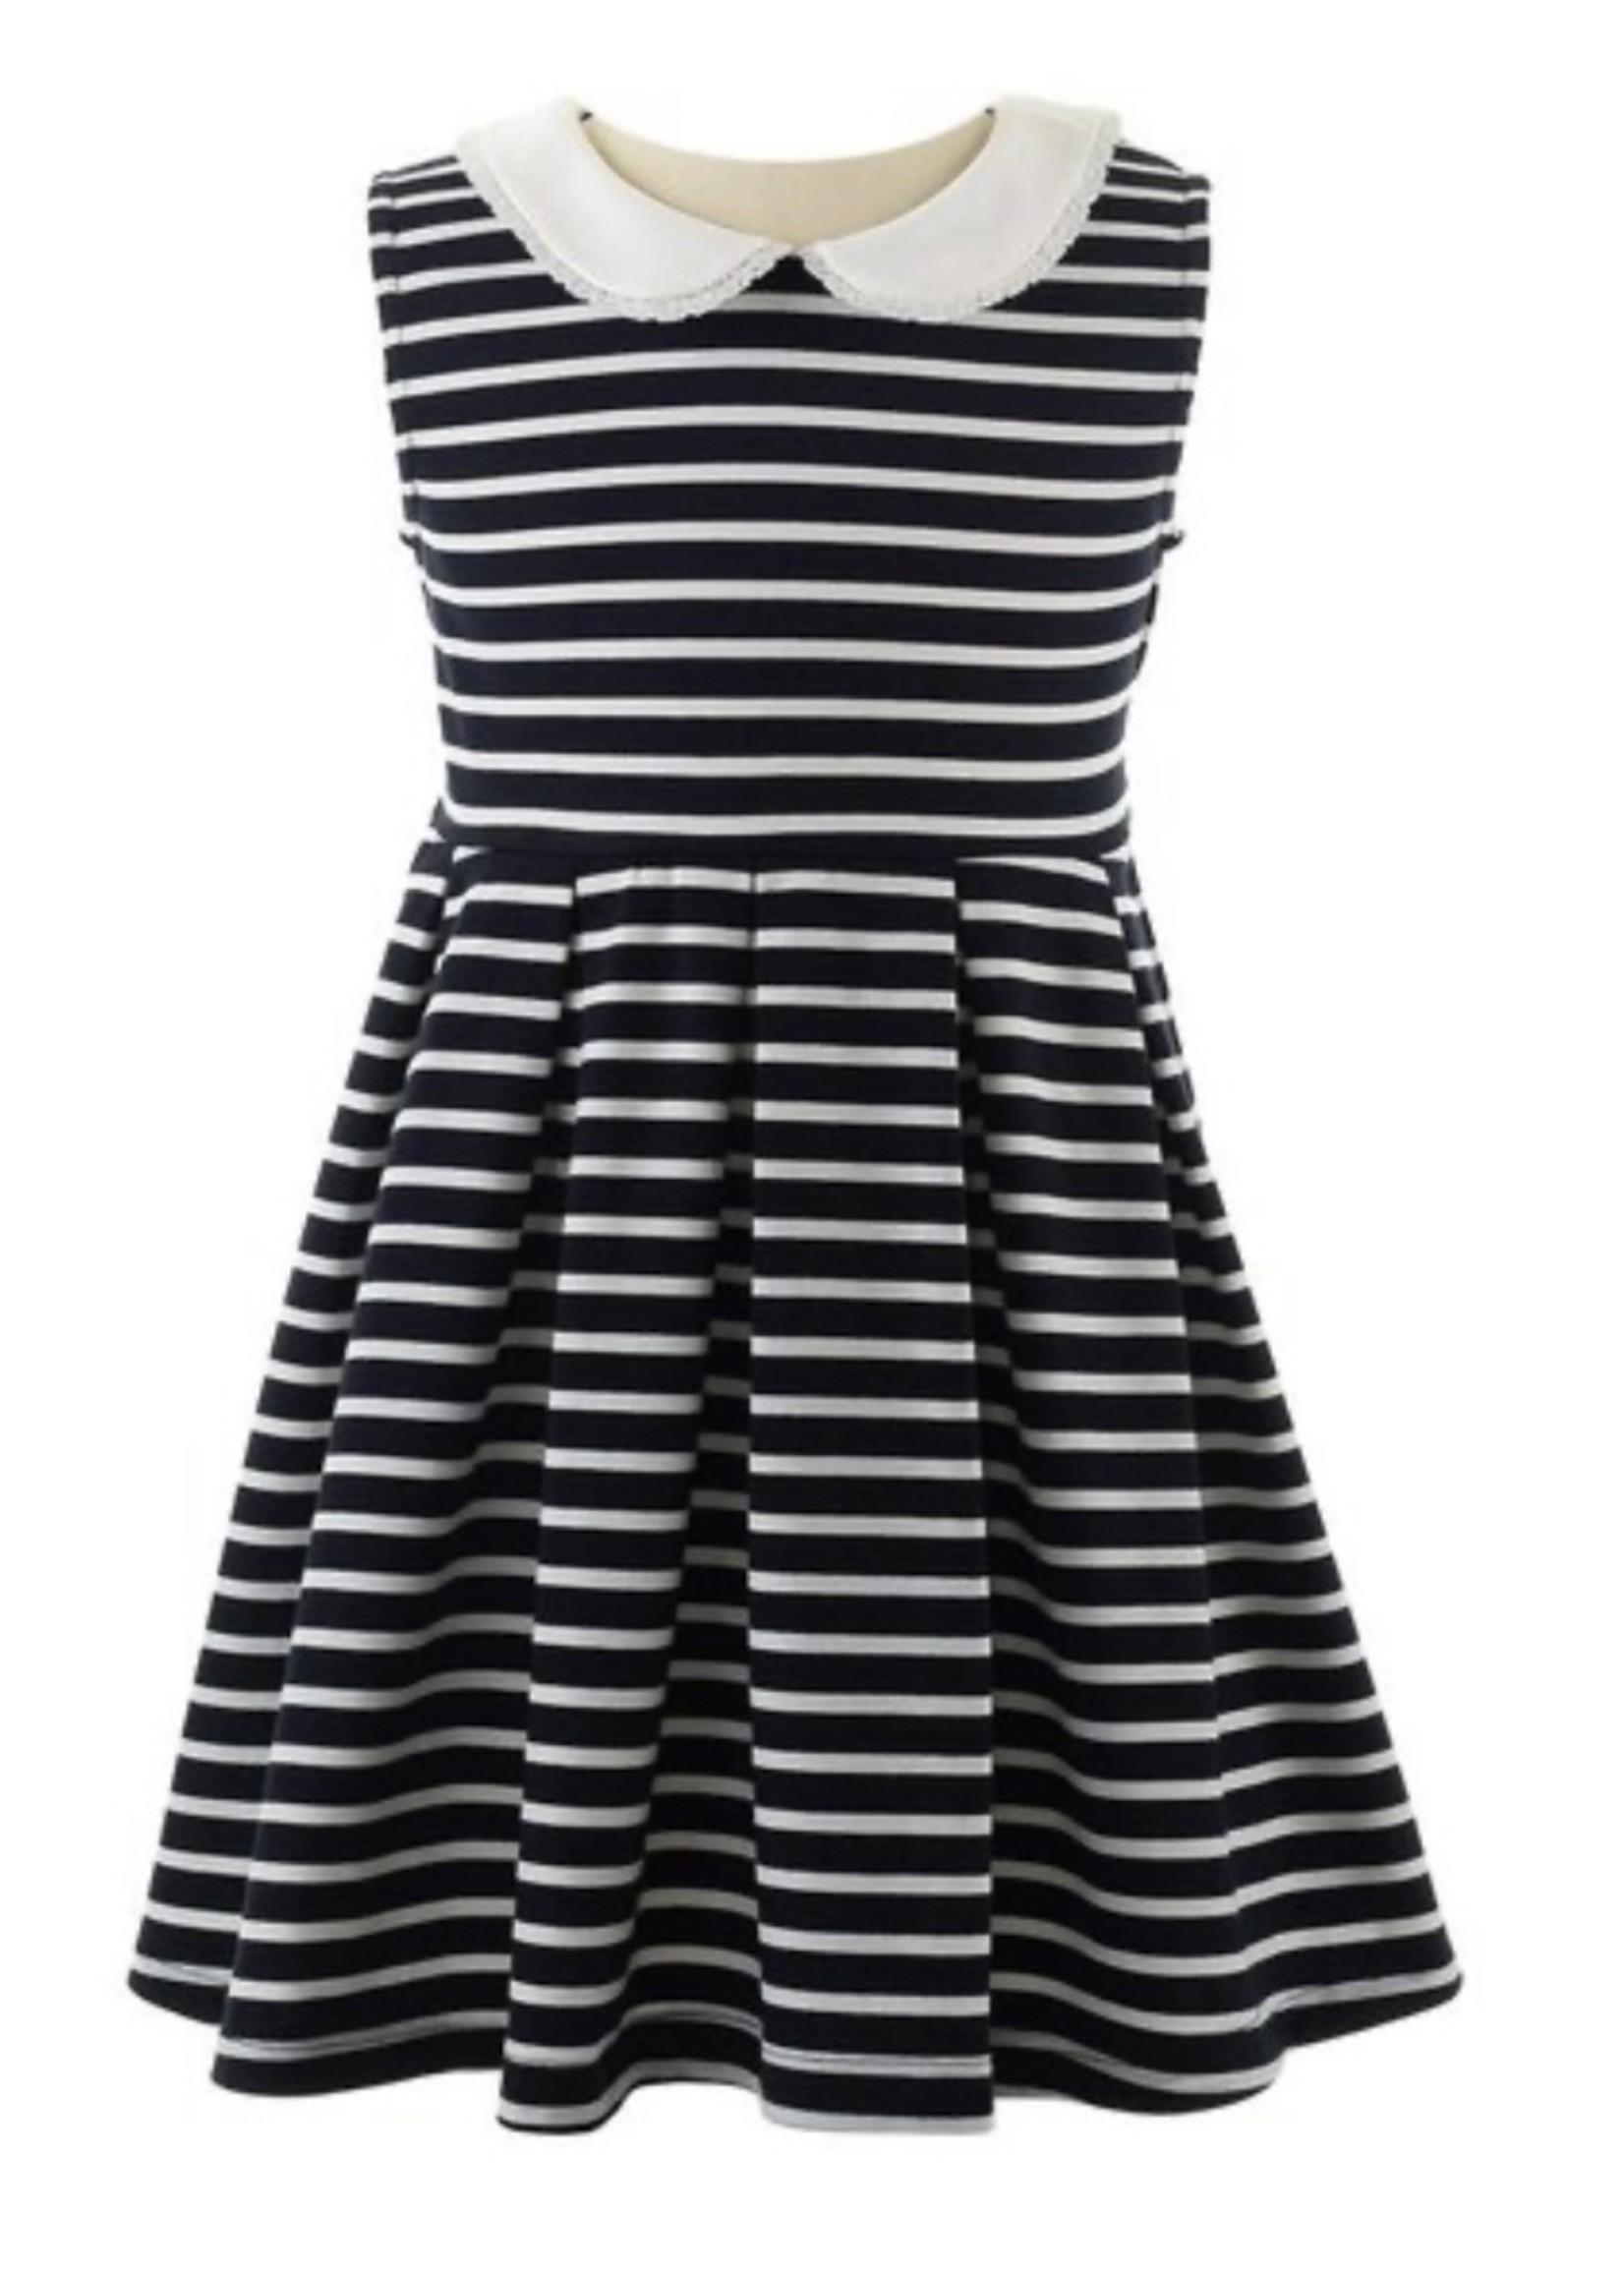 B/I Breton Stripe Jersey Dress